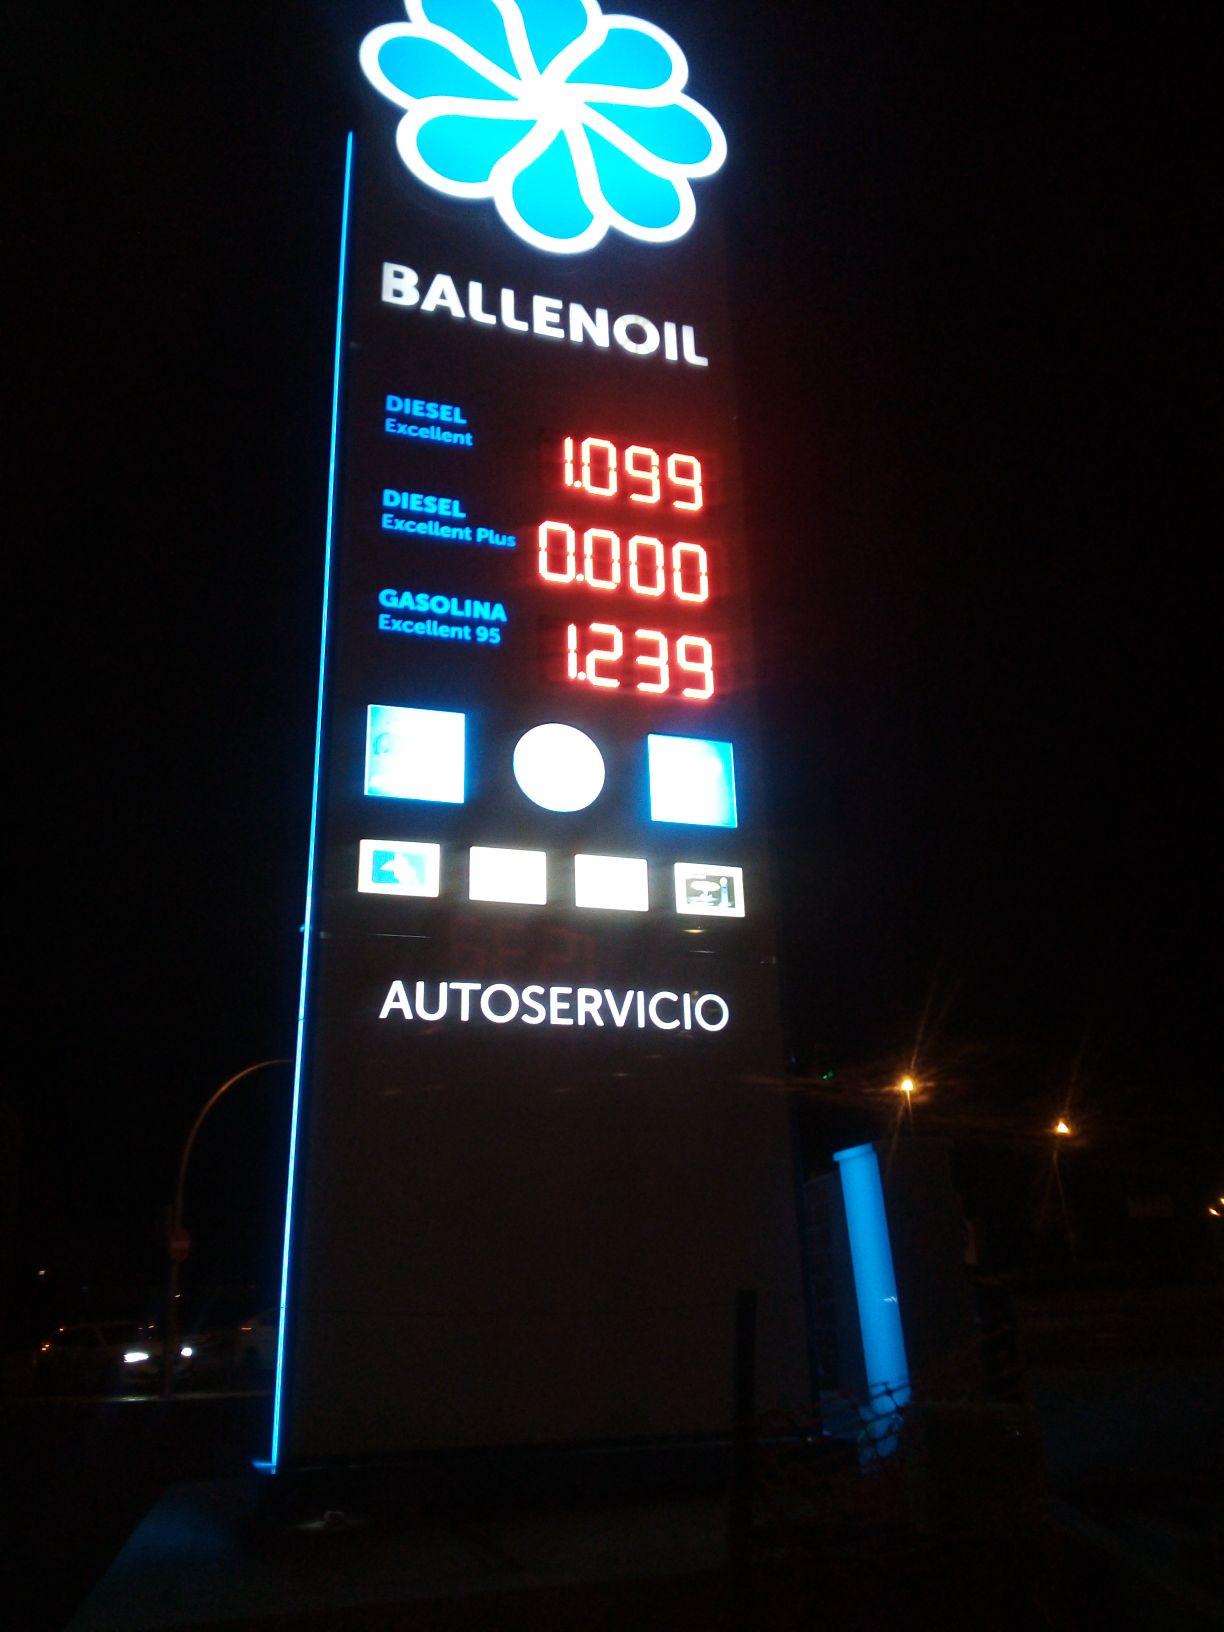 Apertura gasolinera Ballenoil-  Diesel 1,09€ Gasolina 1,23€ (Junto a la M-40)